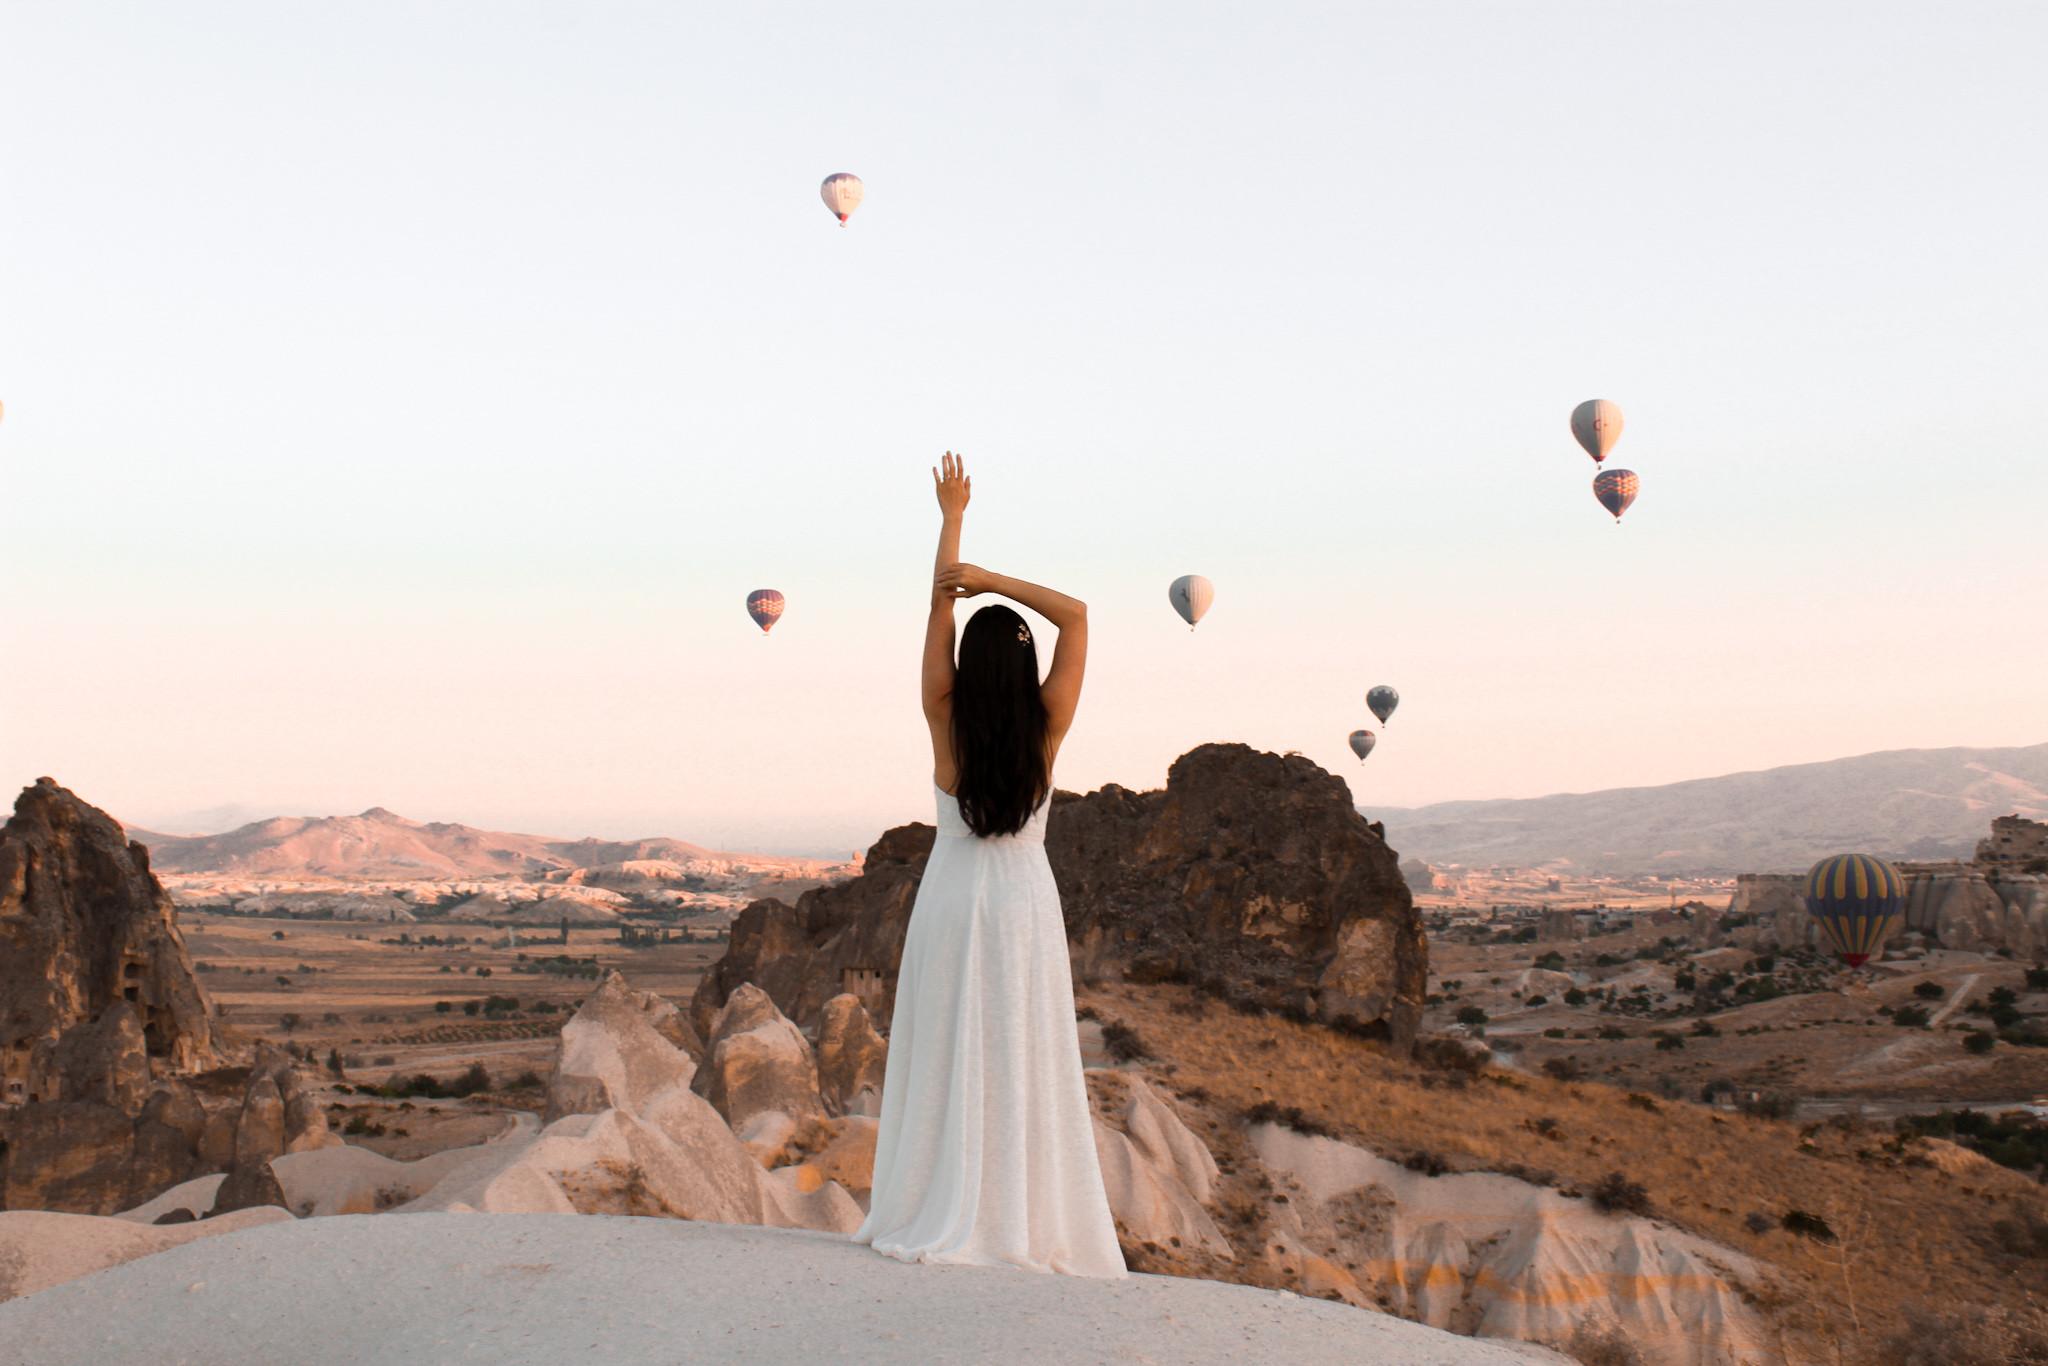 hot air balloon wedding - Cappadocia wedding - beautiful elopement photography - Turkish elopement photoshoot -